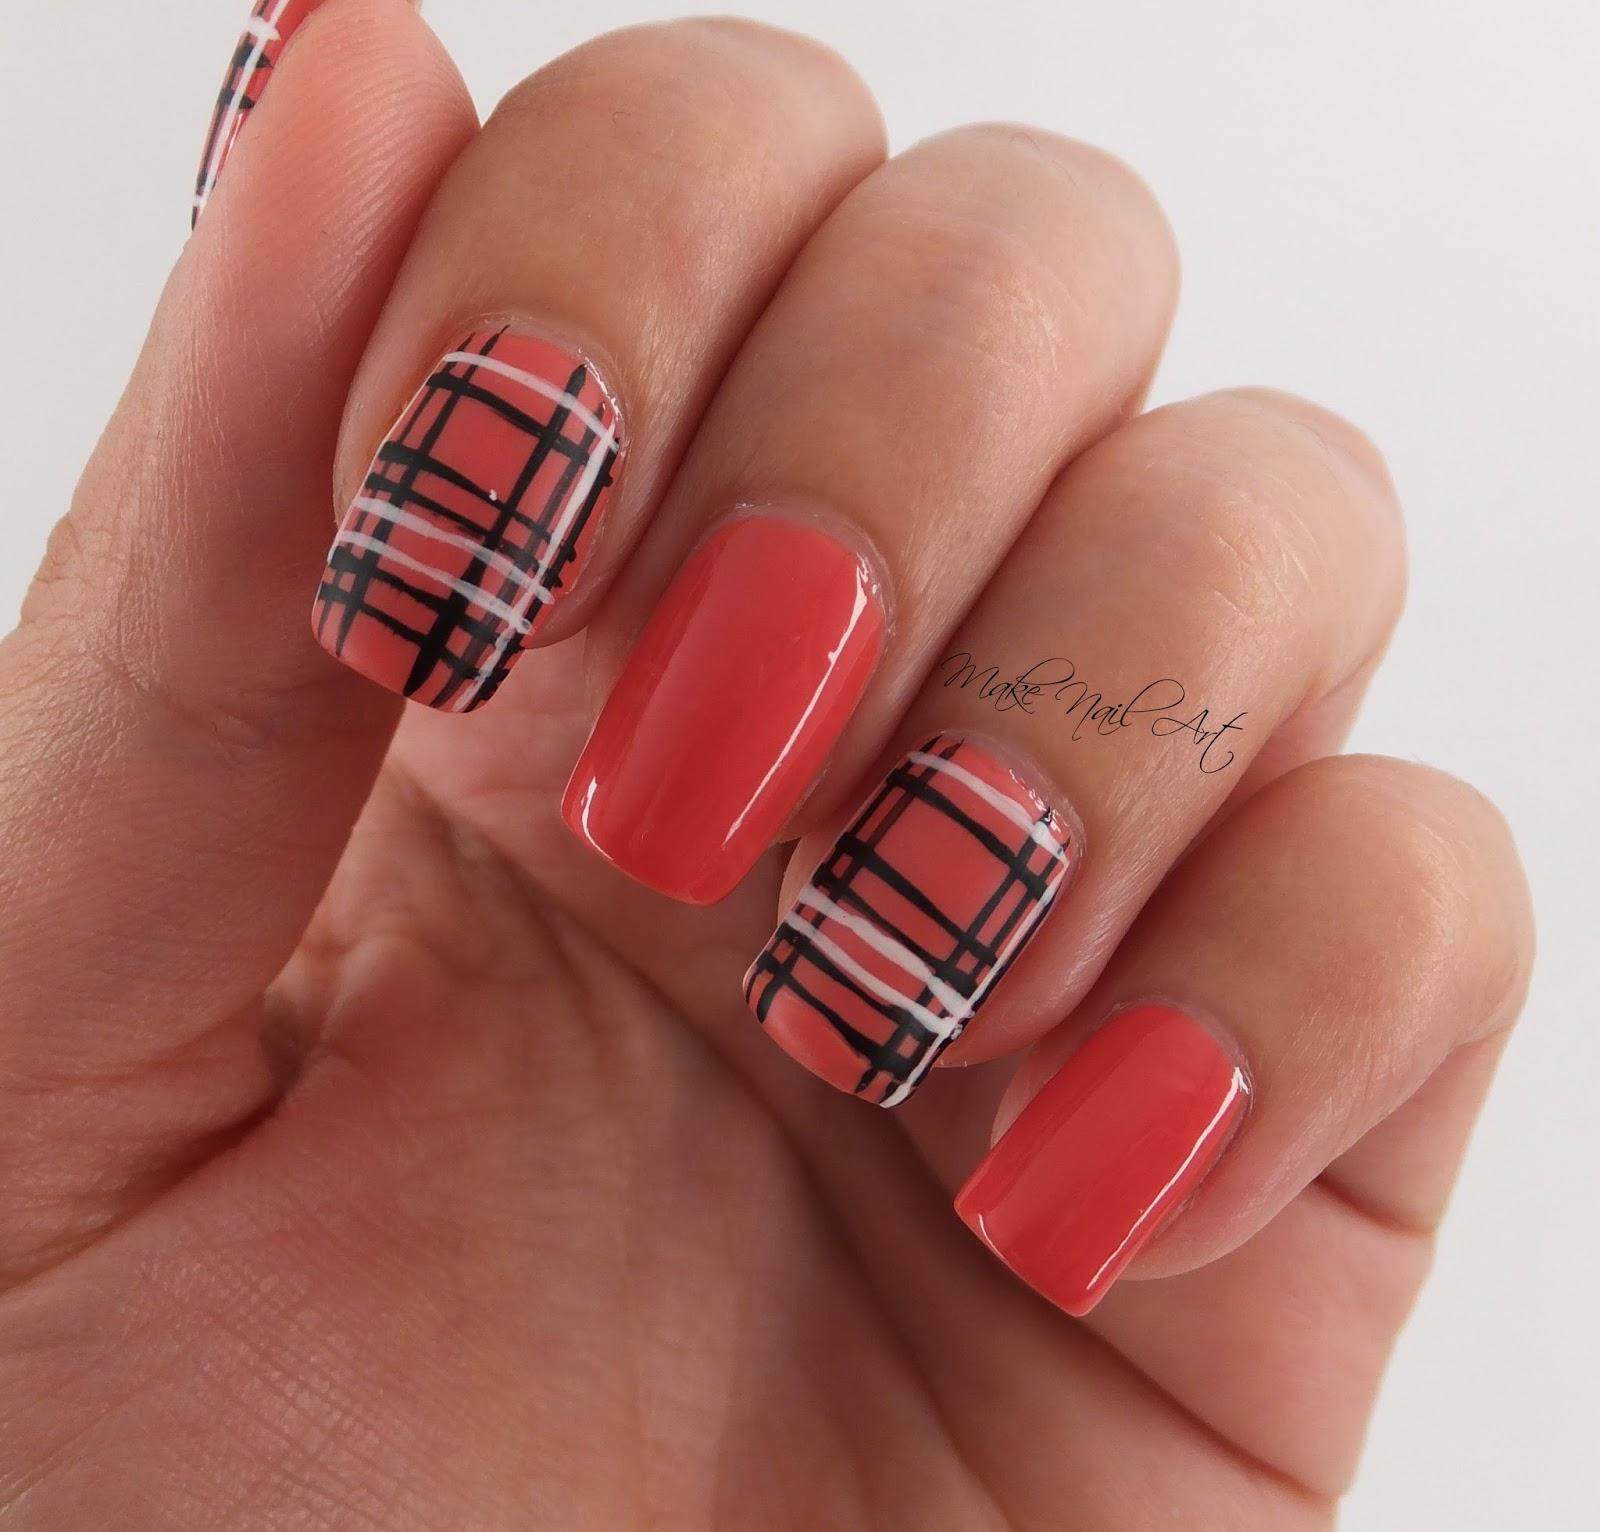 Make Nail Art: Easy Autumn Plaid Nails Nail Art Design ...